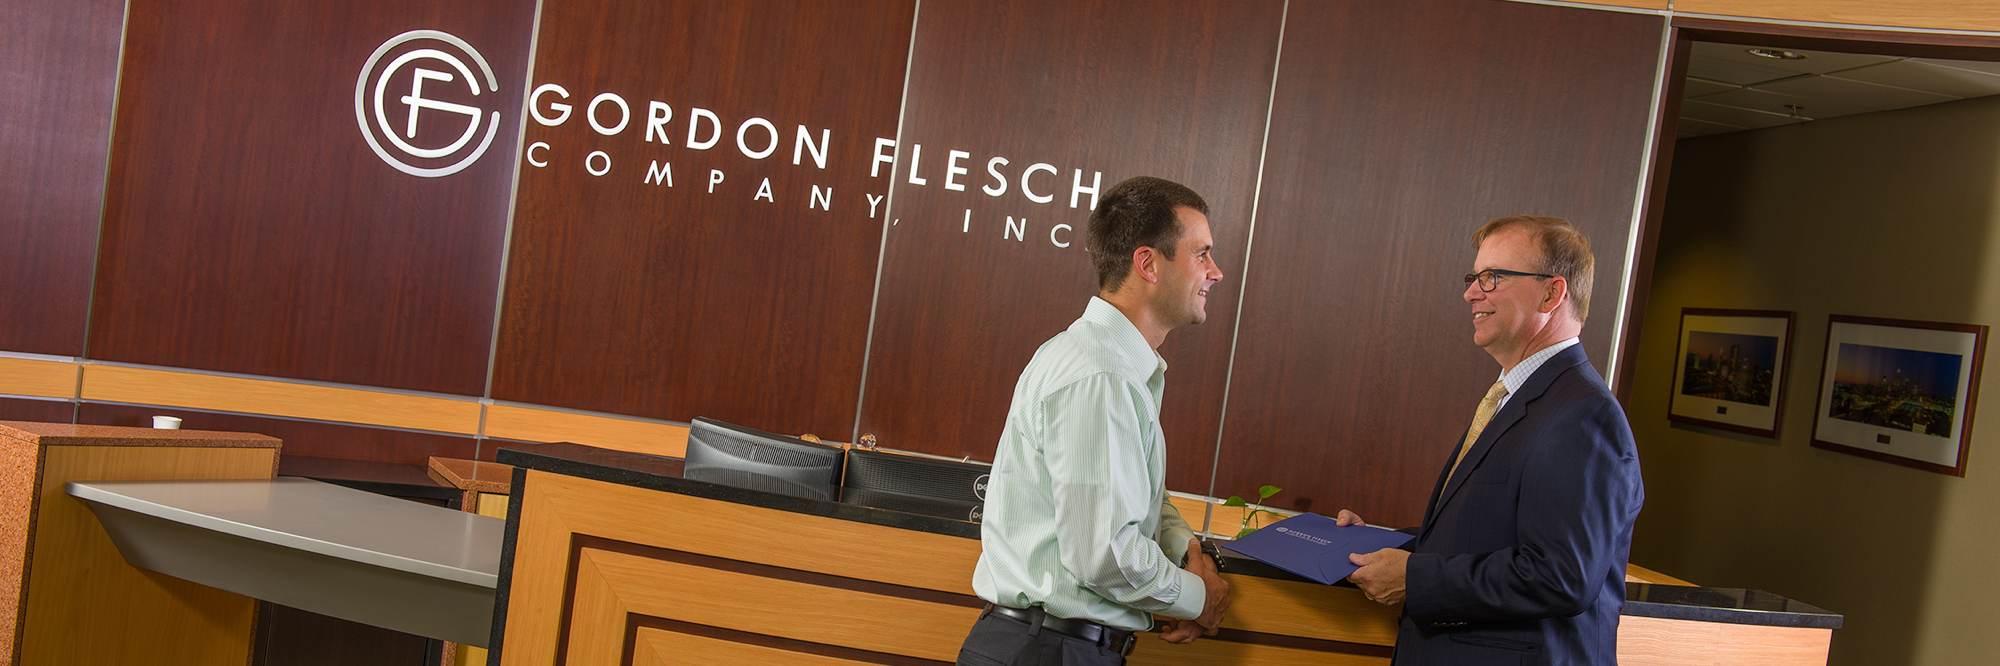 two-men-talking-at-desk-in-front-of-gordon-flesch-sign.jpg